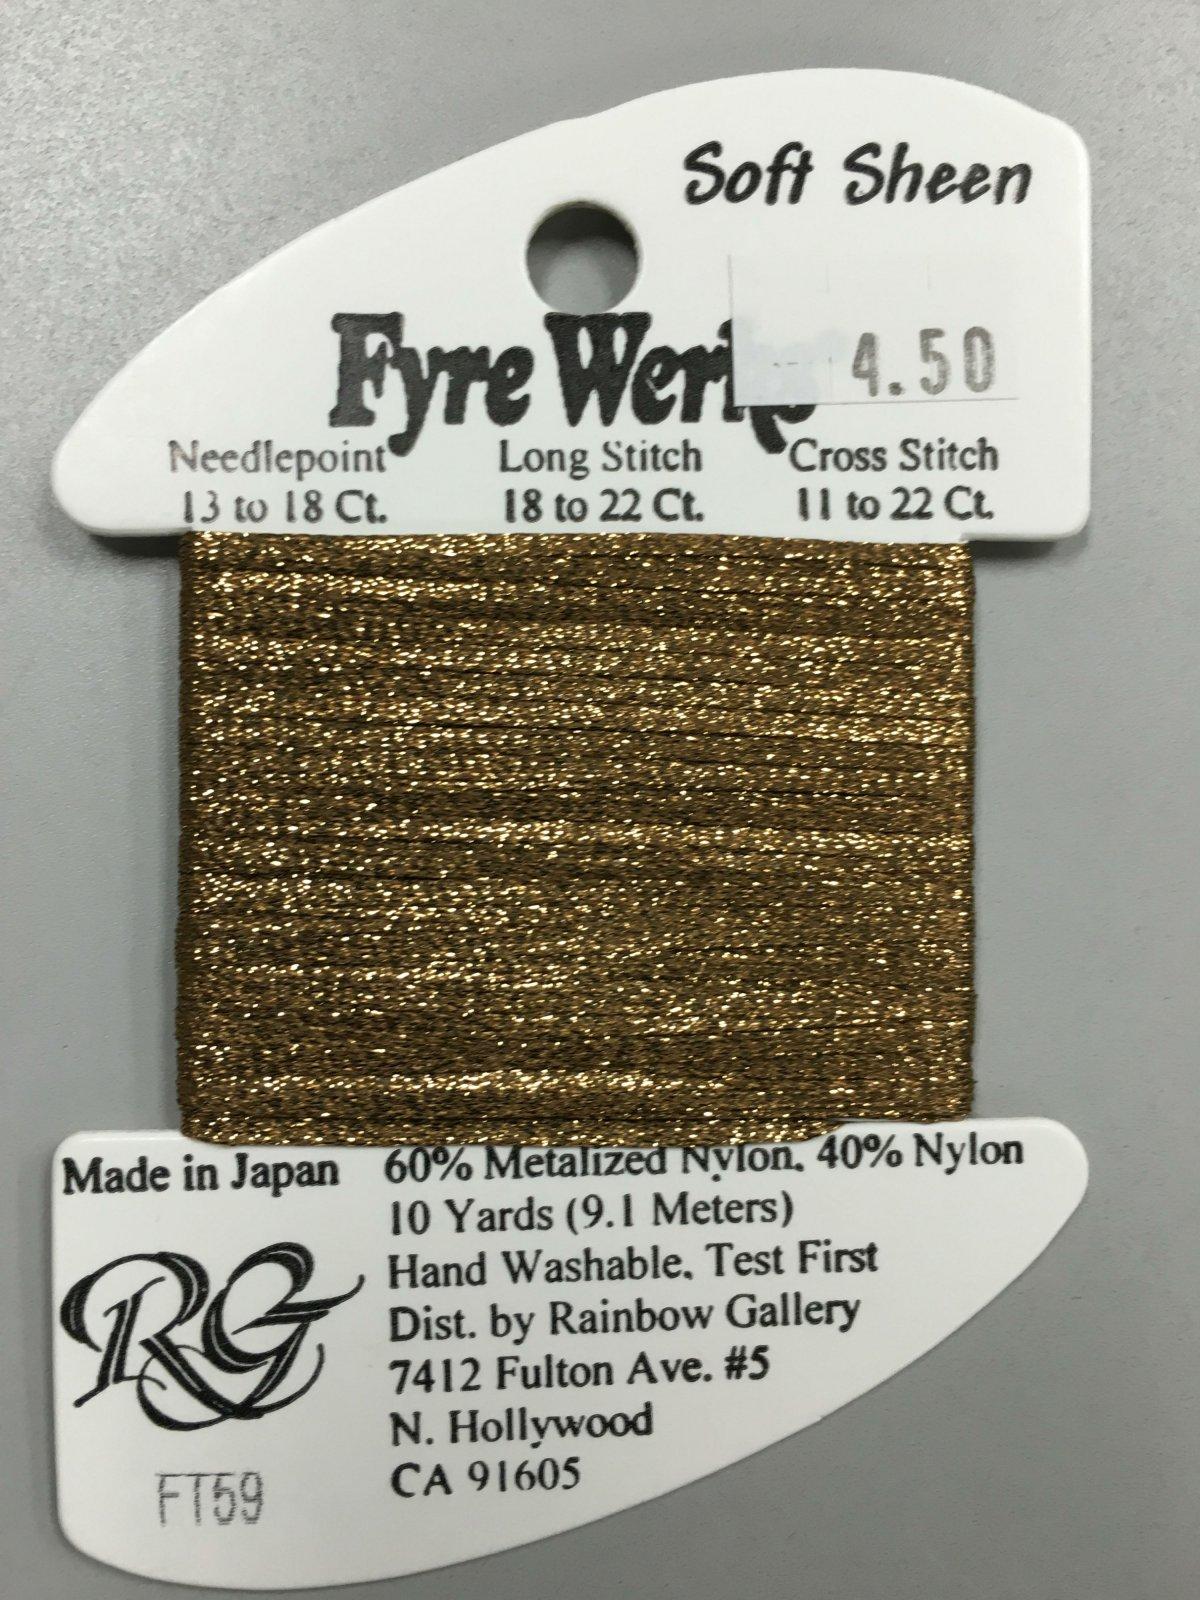 Fyre Werks Soft Sheen FT59